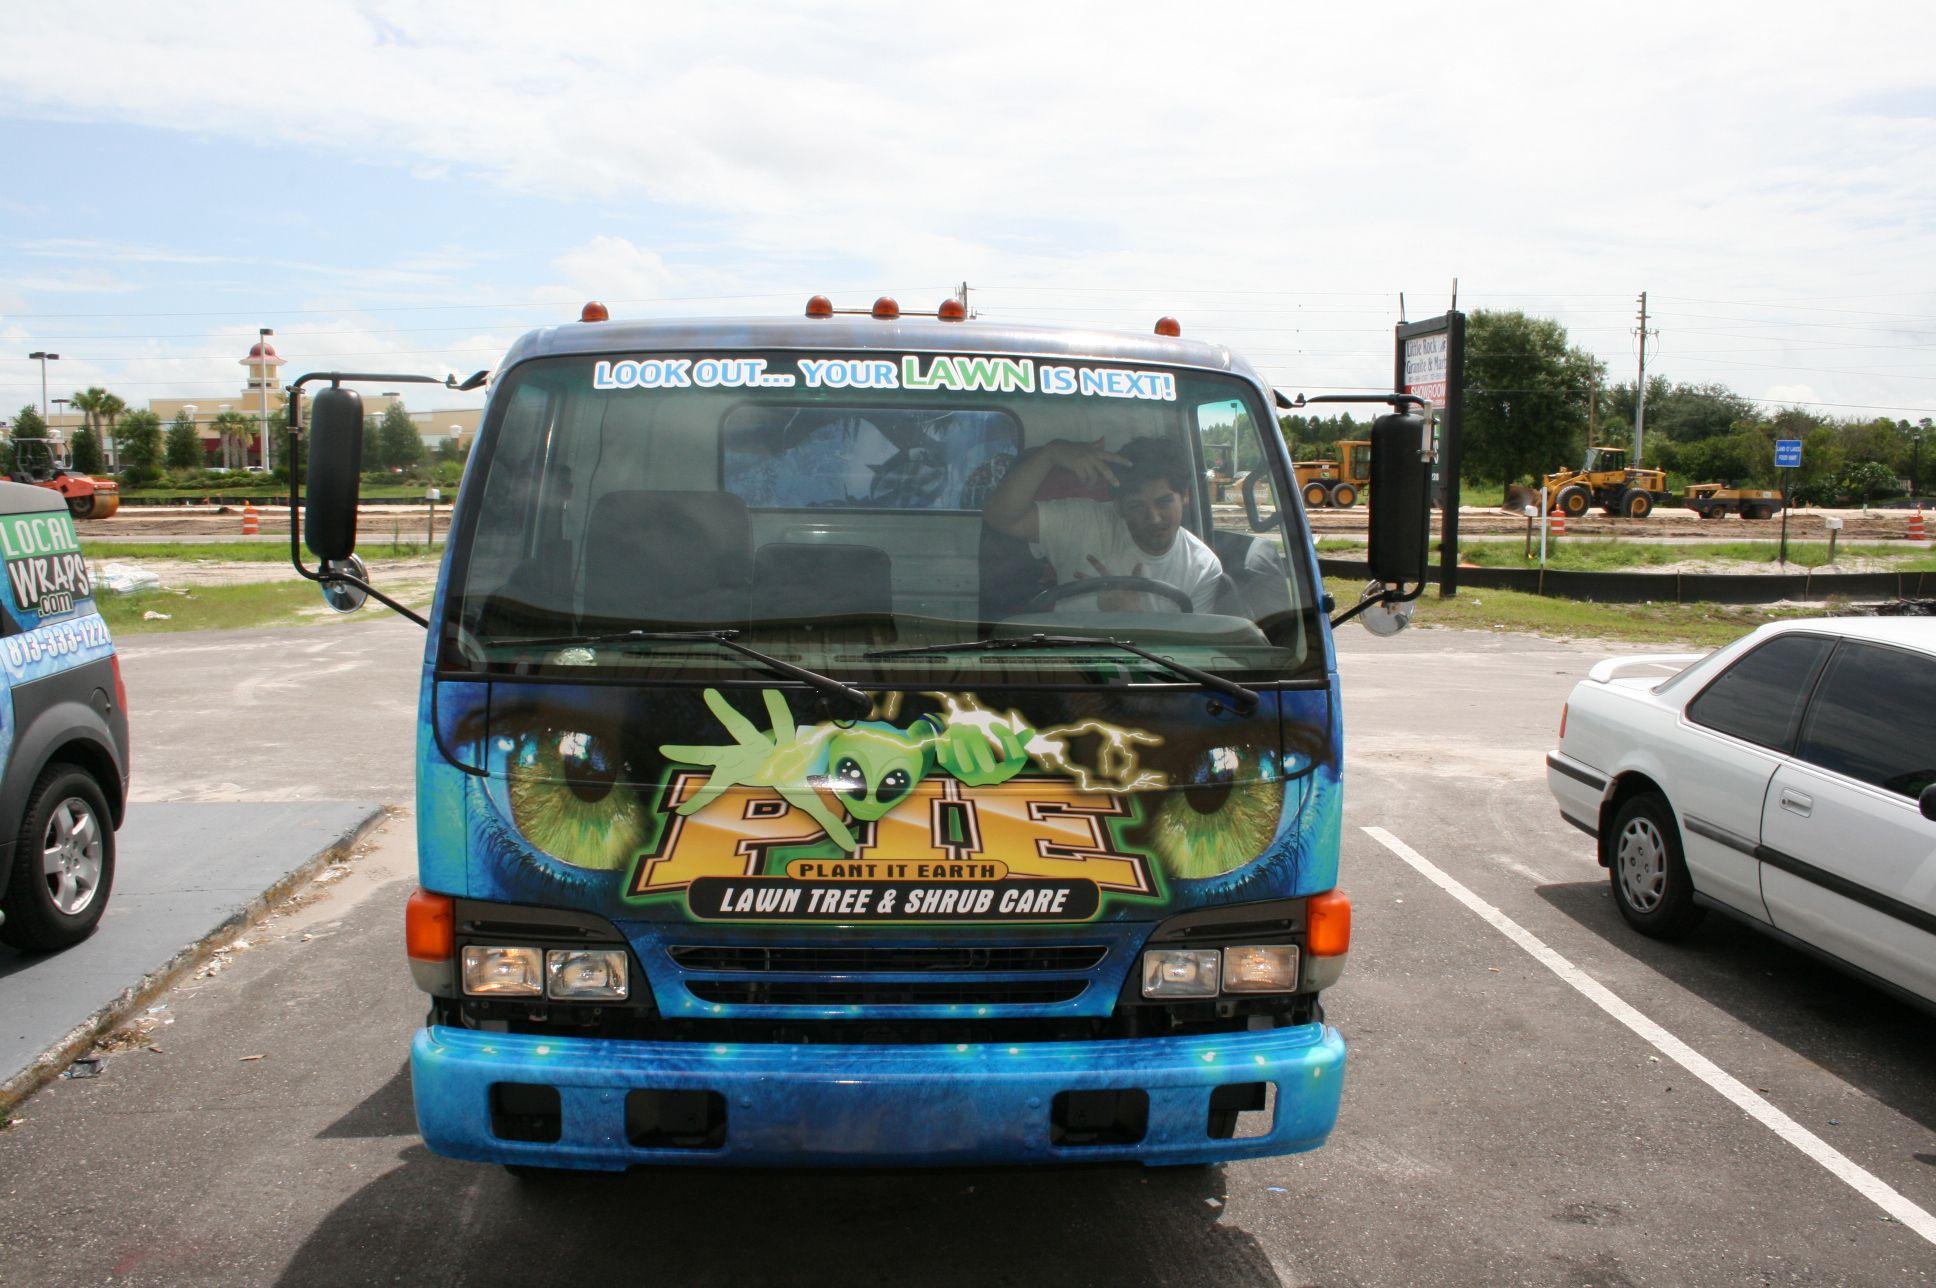 Captivating Plant It Earth Alien S Me Plant It Earth Alien S Me Spray Truck Wraps Pinterest Plant It Earth Bradenton Fl Plant It Earth Bradenton houzz-03 Plant It Earth